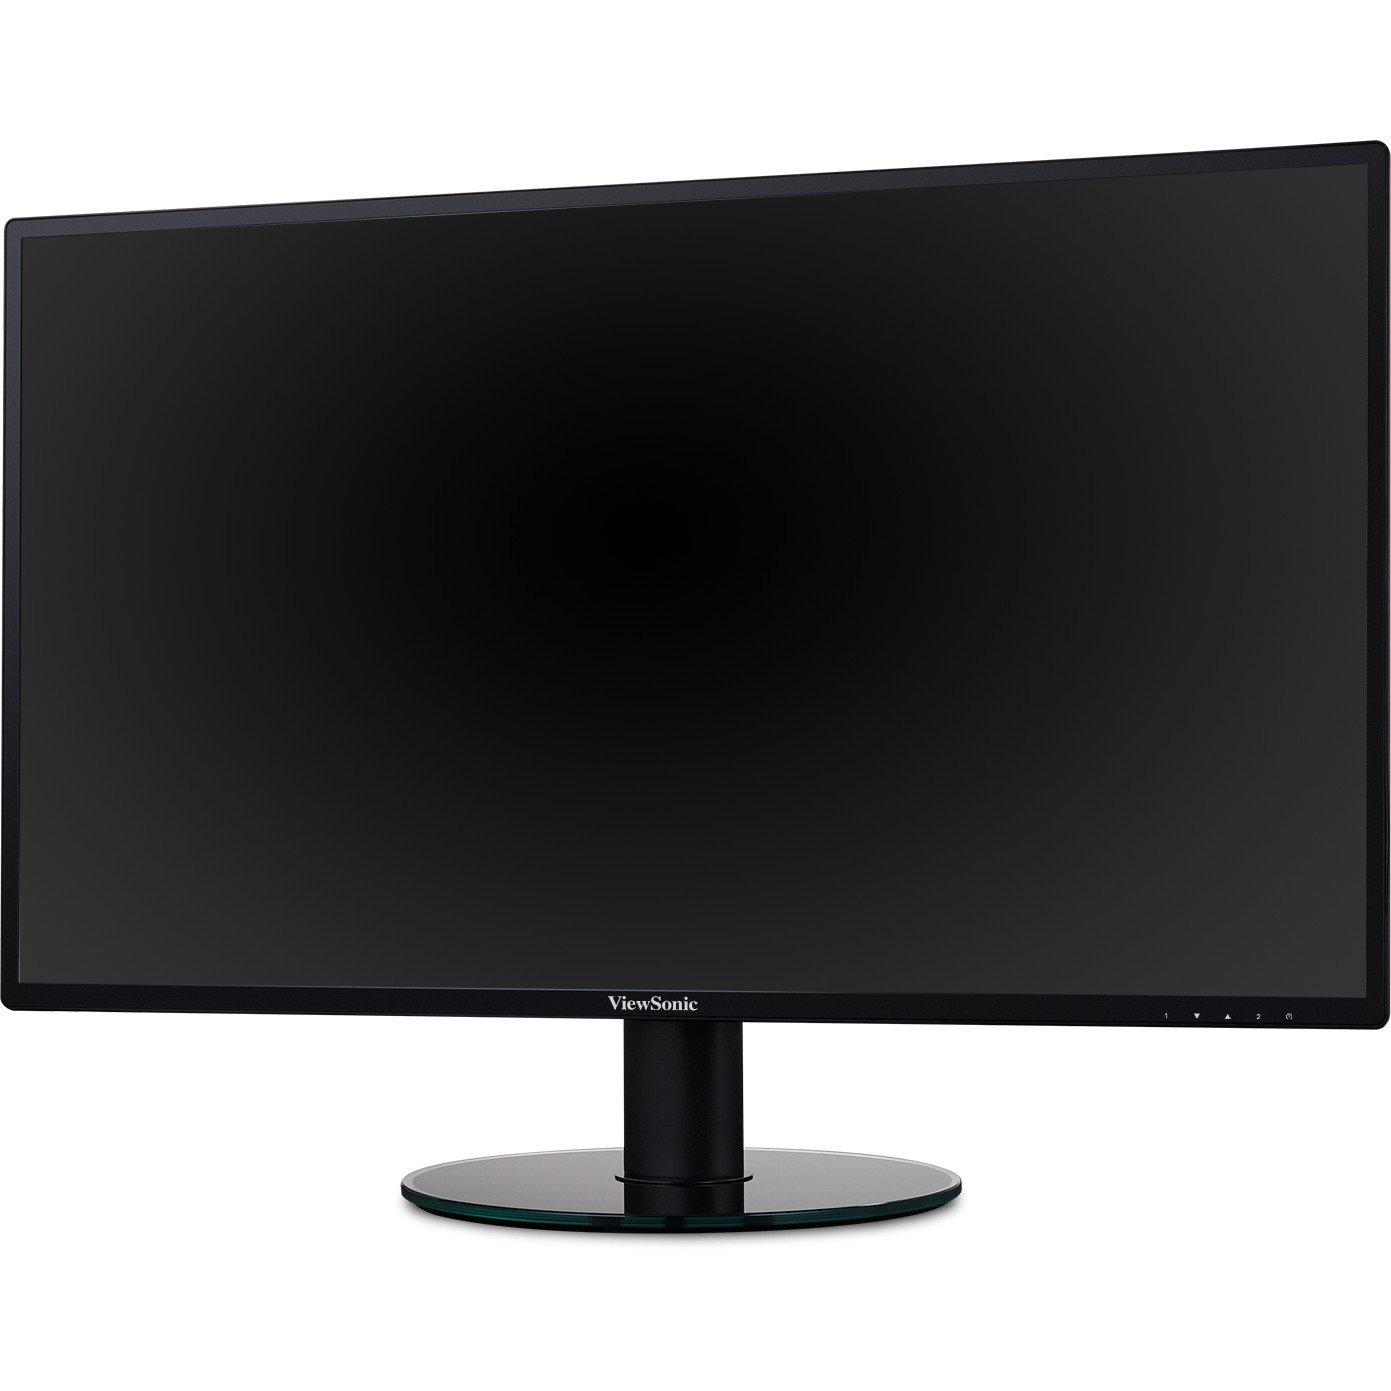 "Viewsonic VA2719-2K-SMHD 68.6 cm (27"") WLED LCD Monitor - 16:9 - 5 ms"